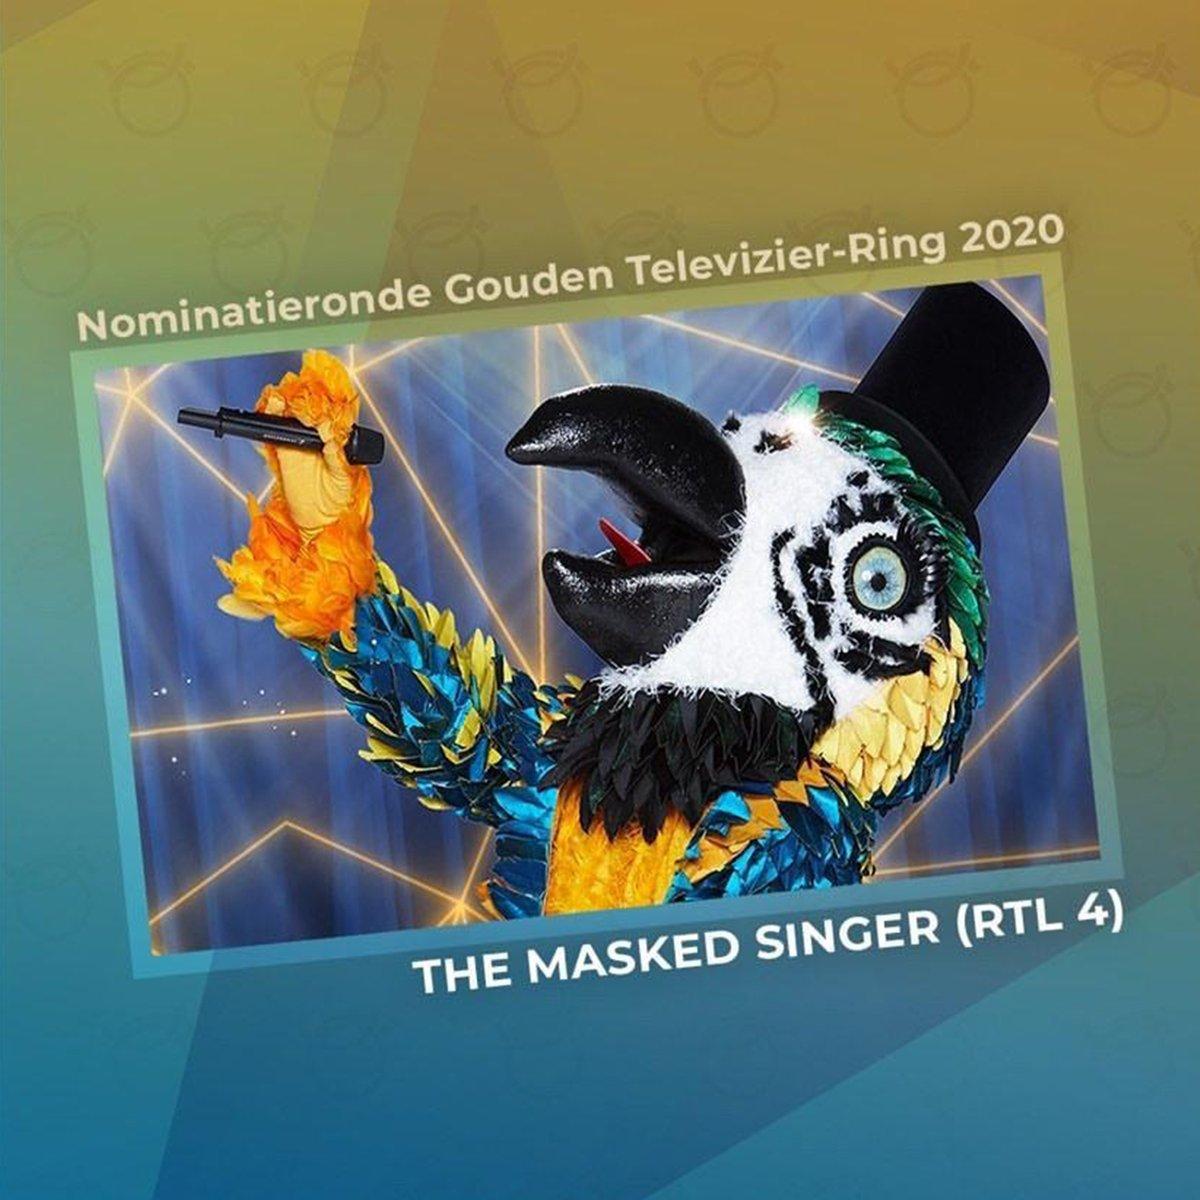 'The Masked Singer' is gekwalificeerd voor de 'Gouden Televizier-Ring'! 💍 Stemmen jullie ook op dit geweldige programma? 👉 https://t.co/hQfhPv8y3z #gerardjoling #televizierring #themaskedsinger https://t.co/HUyuktojHv